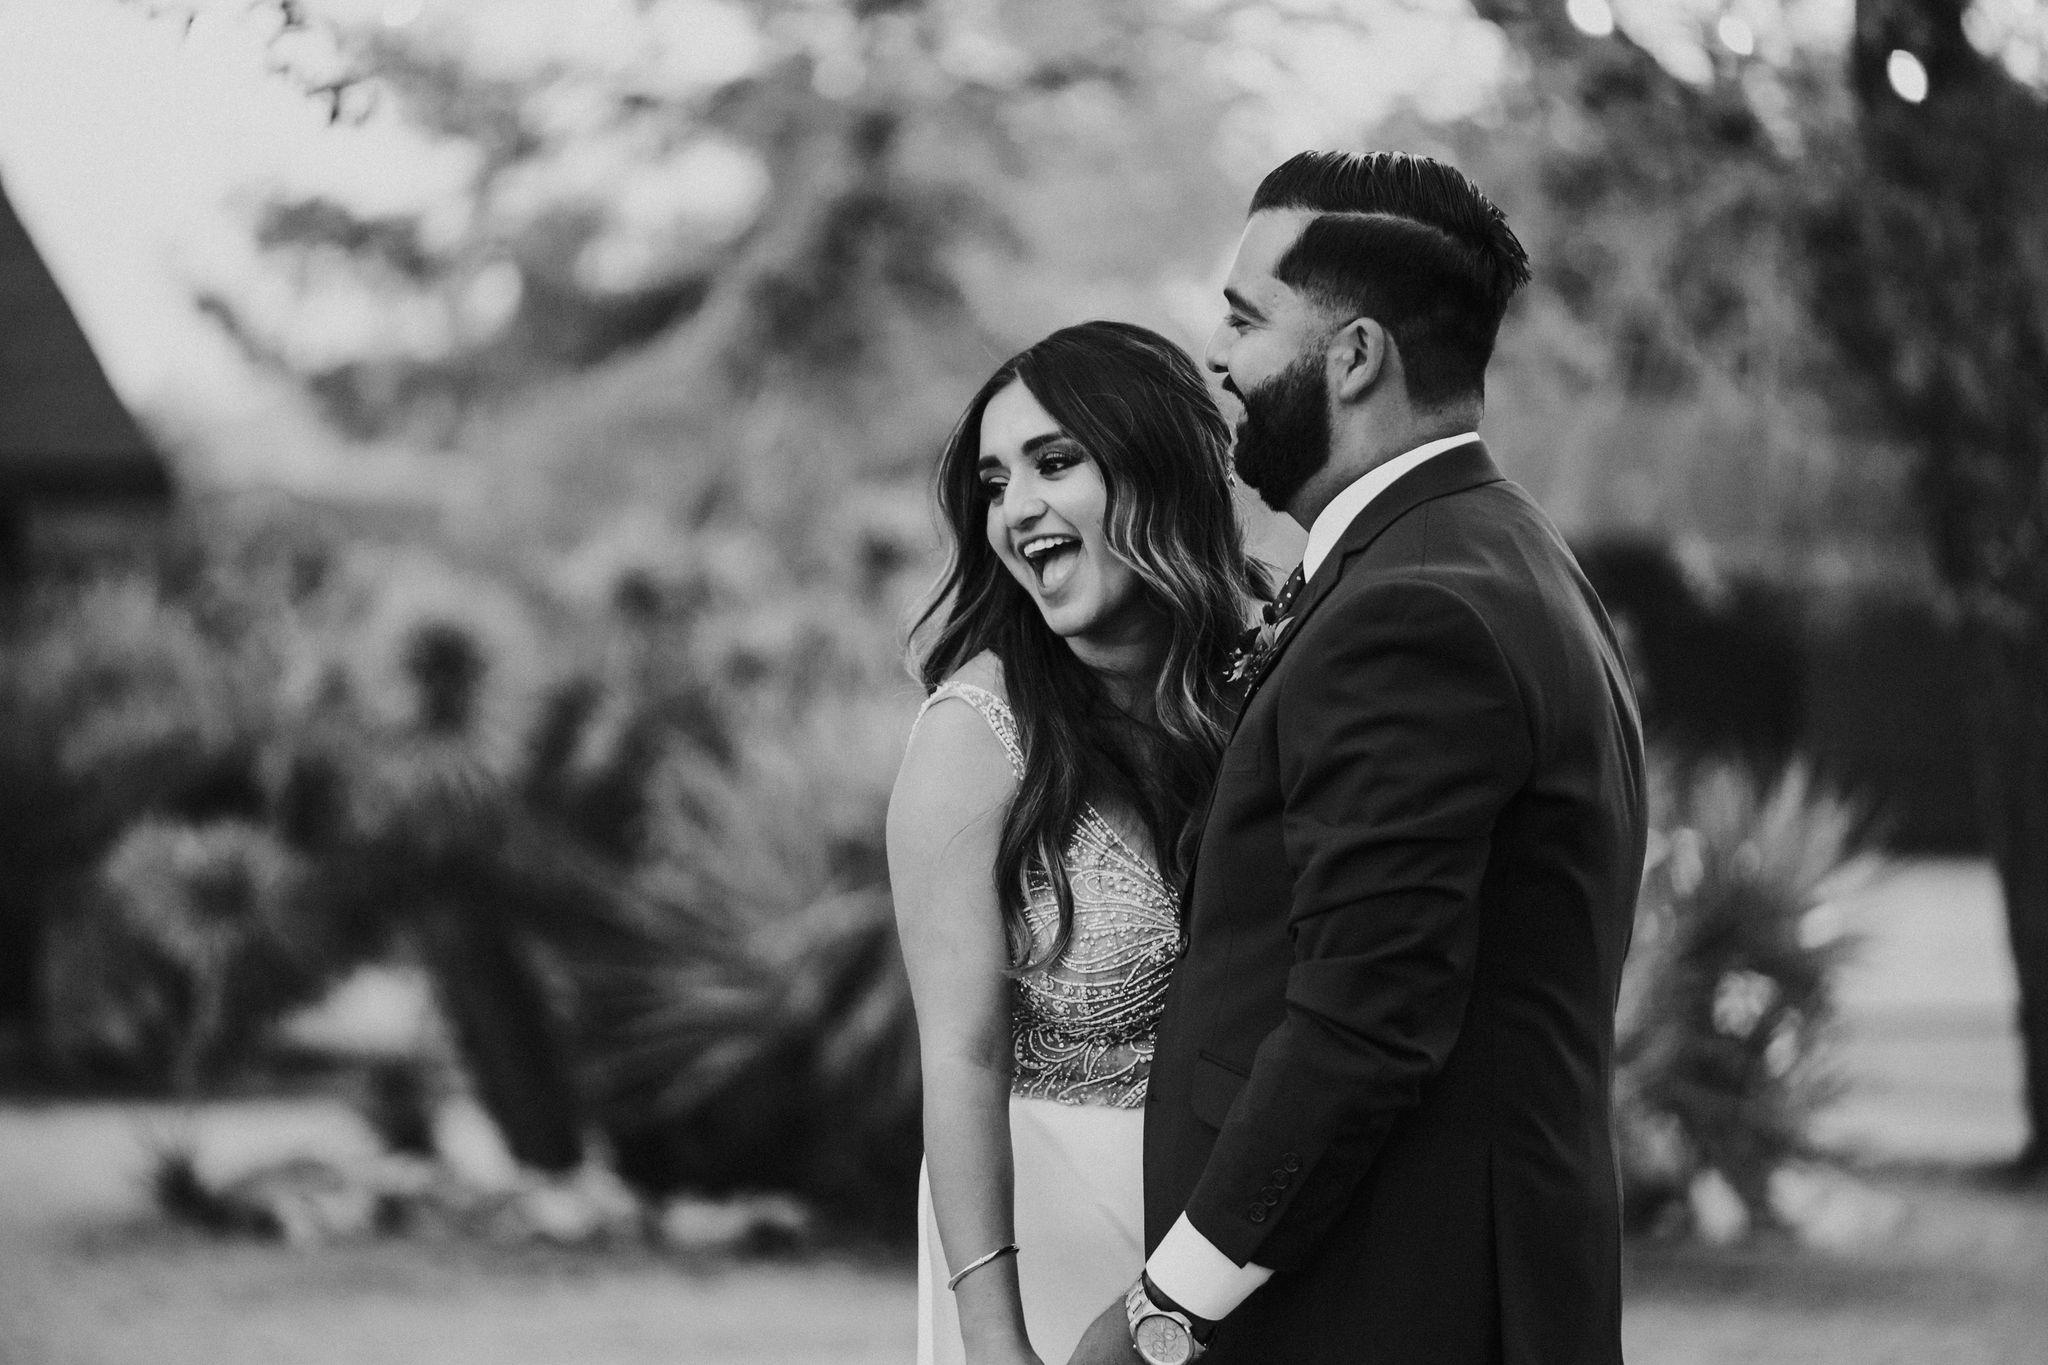 RimrockRanch-JoshuaTree-Wedding-Jami-Laree-851.jpg